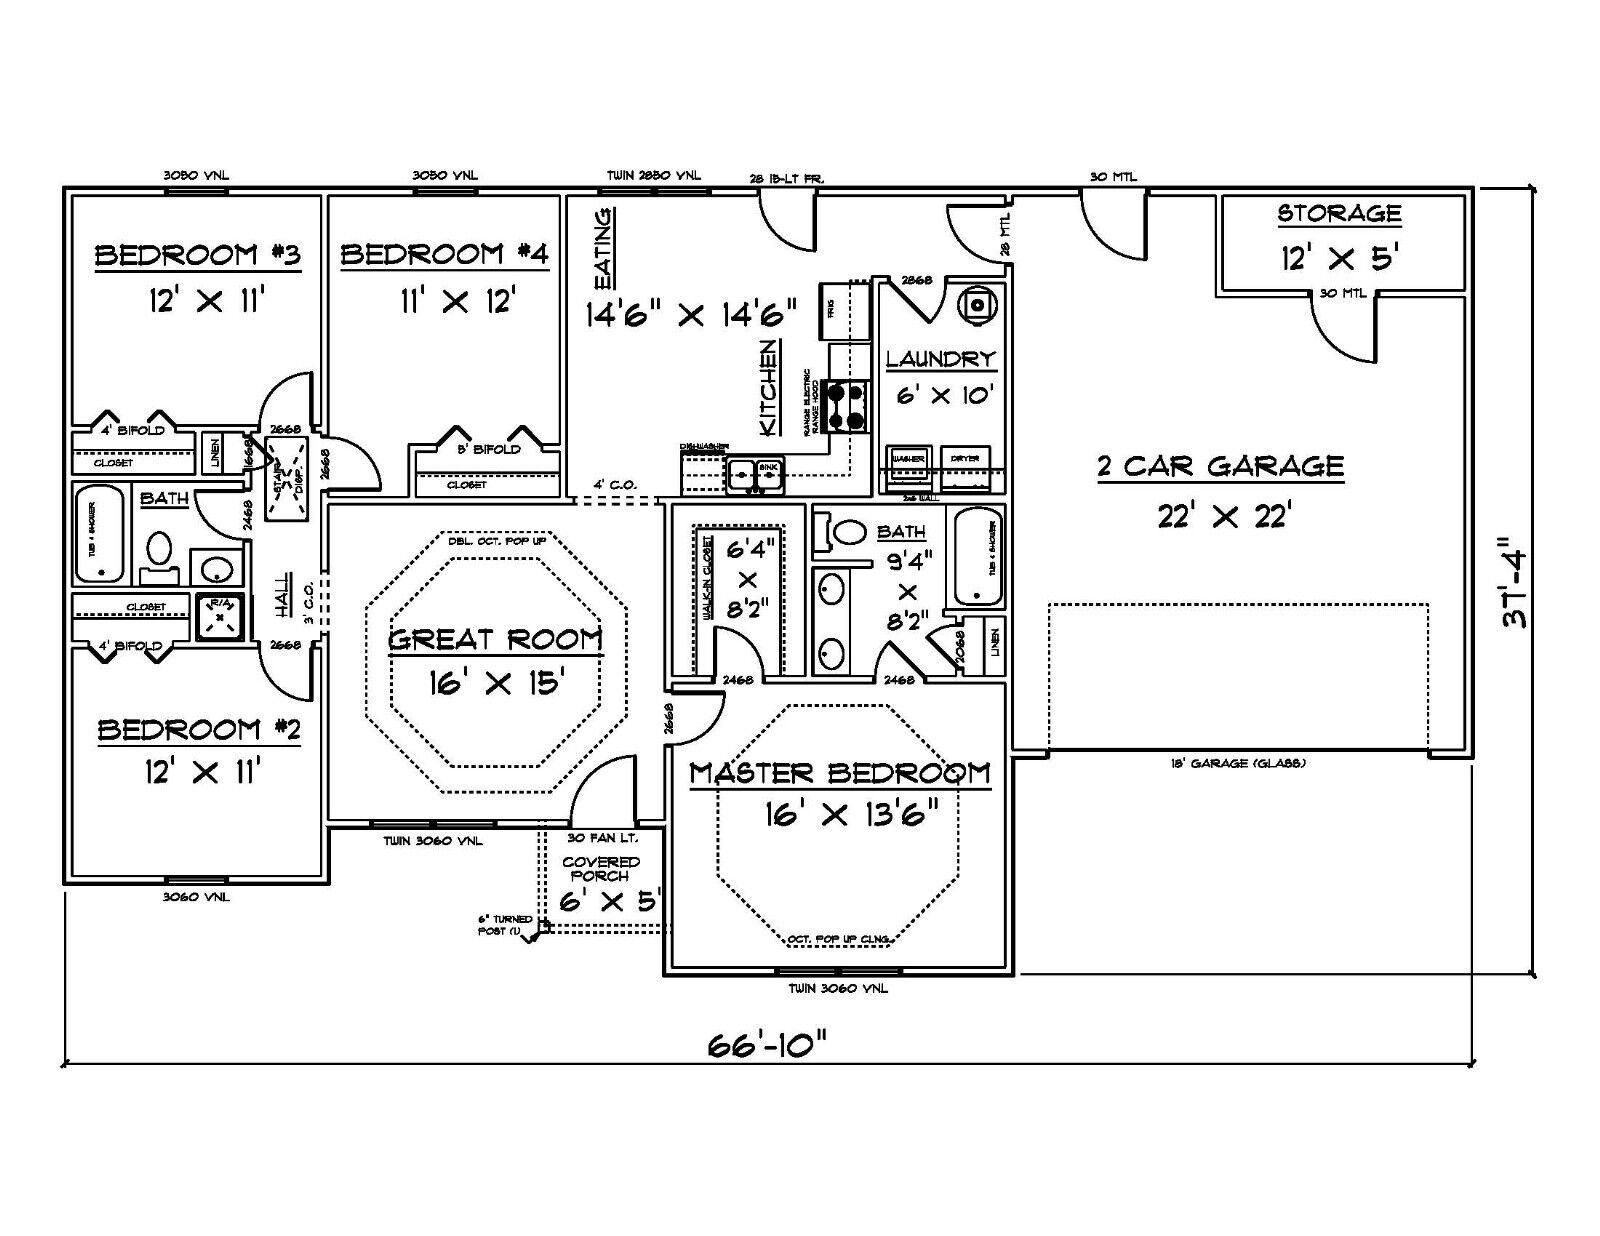 House House House Plans for 1500 Sq. Ft. 4 Bedroom House d5e130